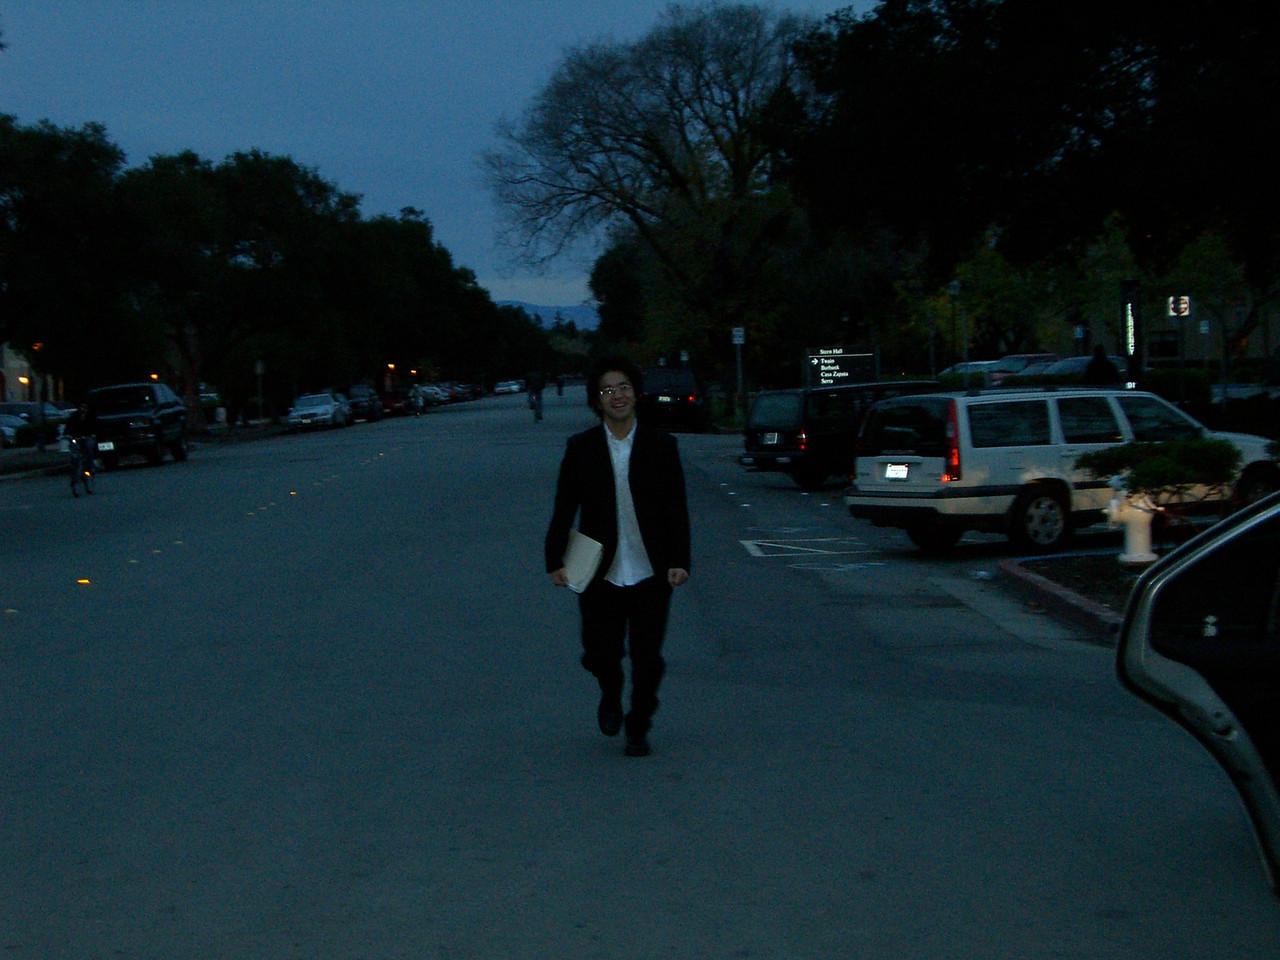 2005 12 04 Sun - Hyungsoo arrives at last